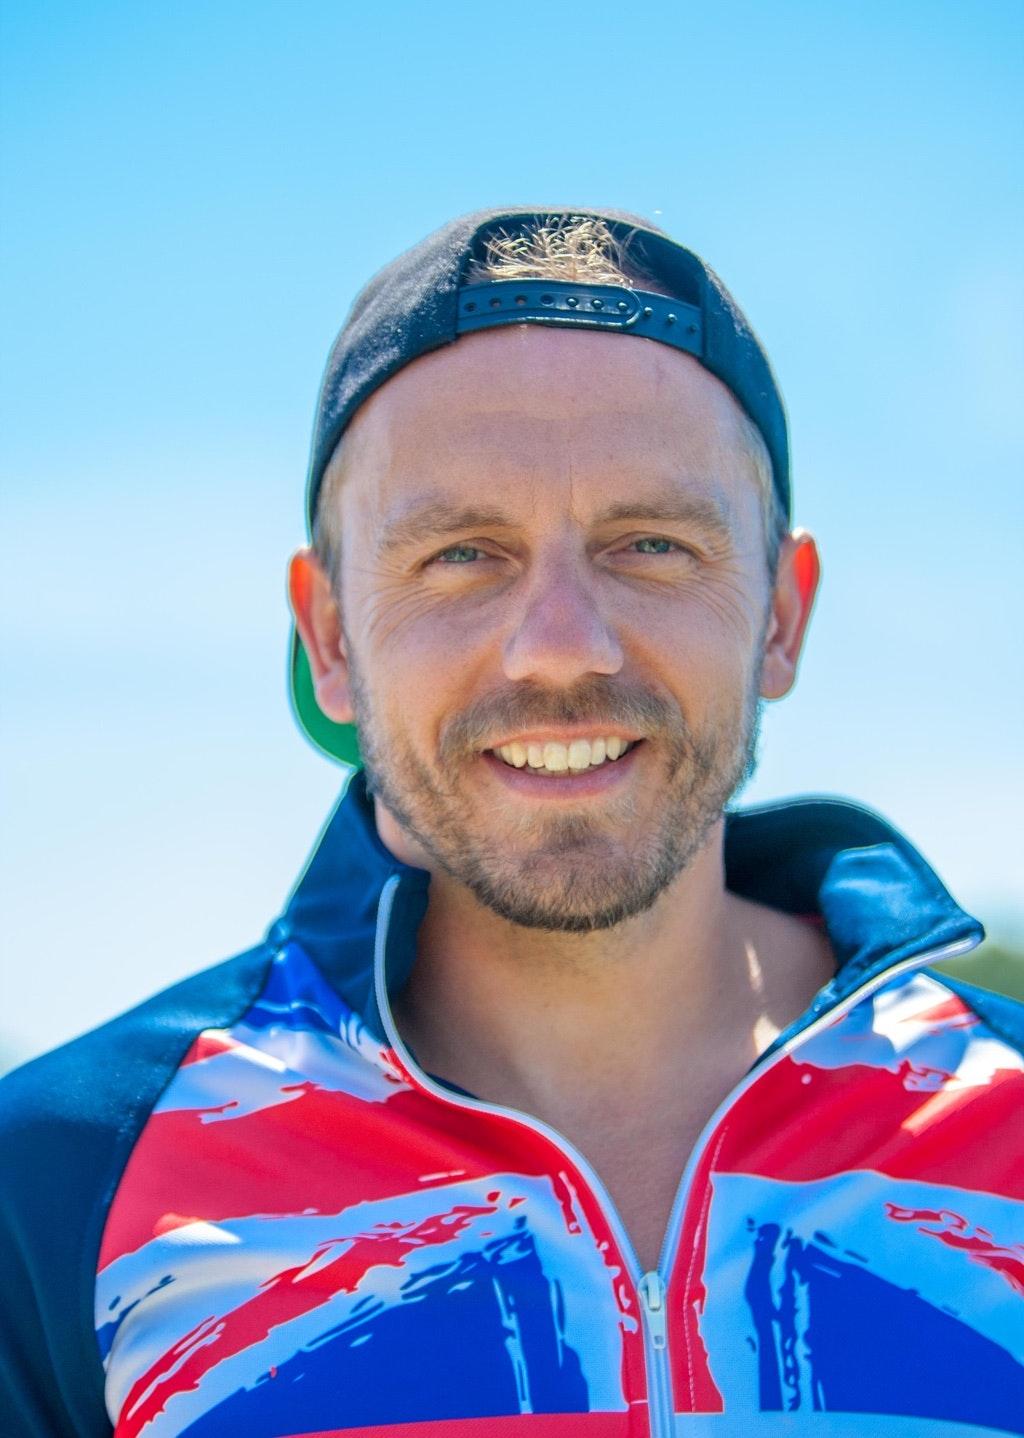 Tony Snelgrove at the 2020 British Wakeboard Squad